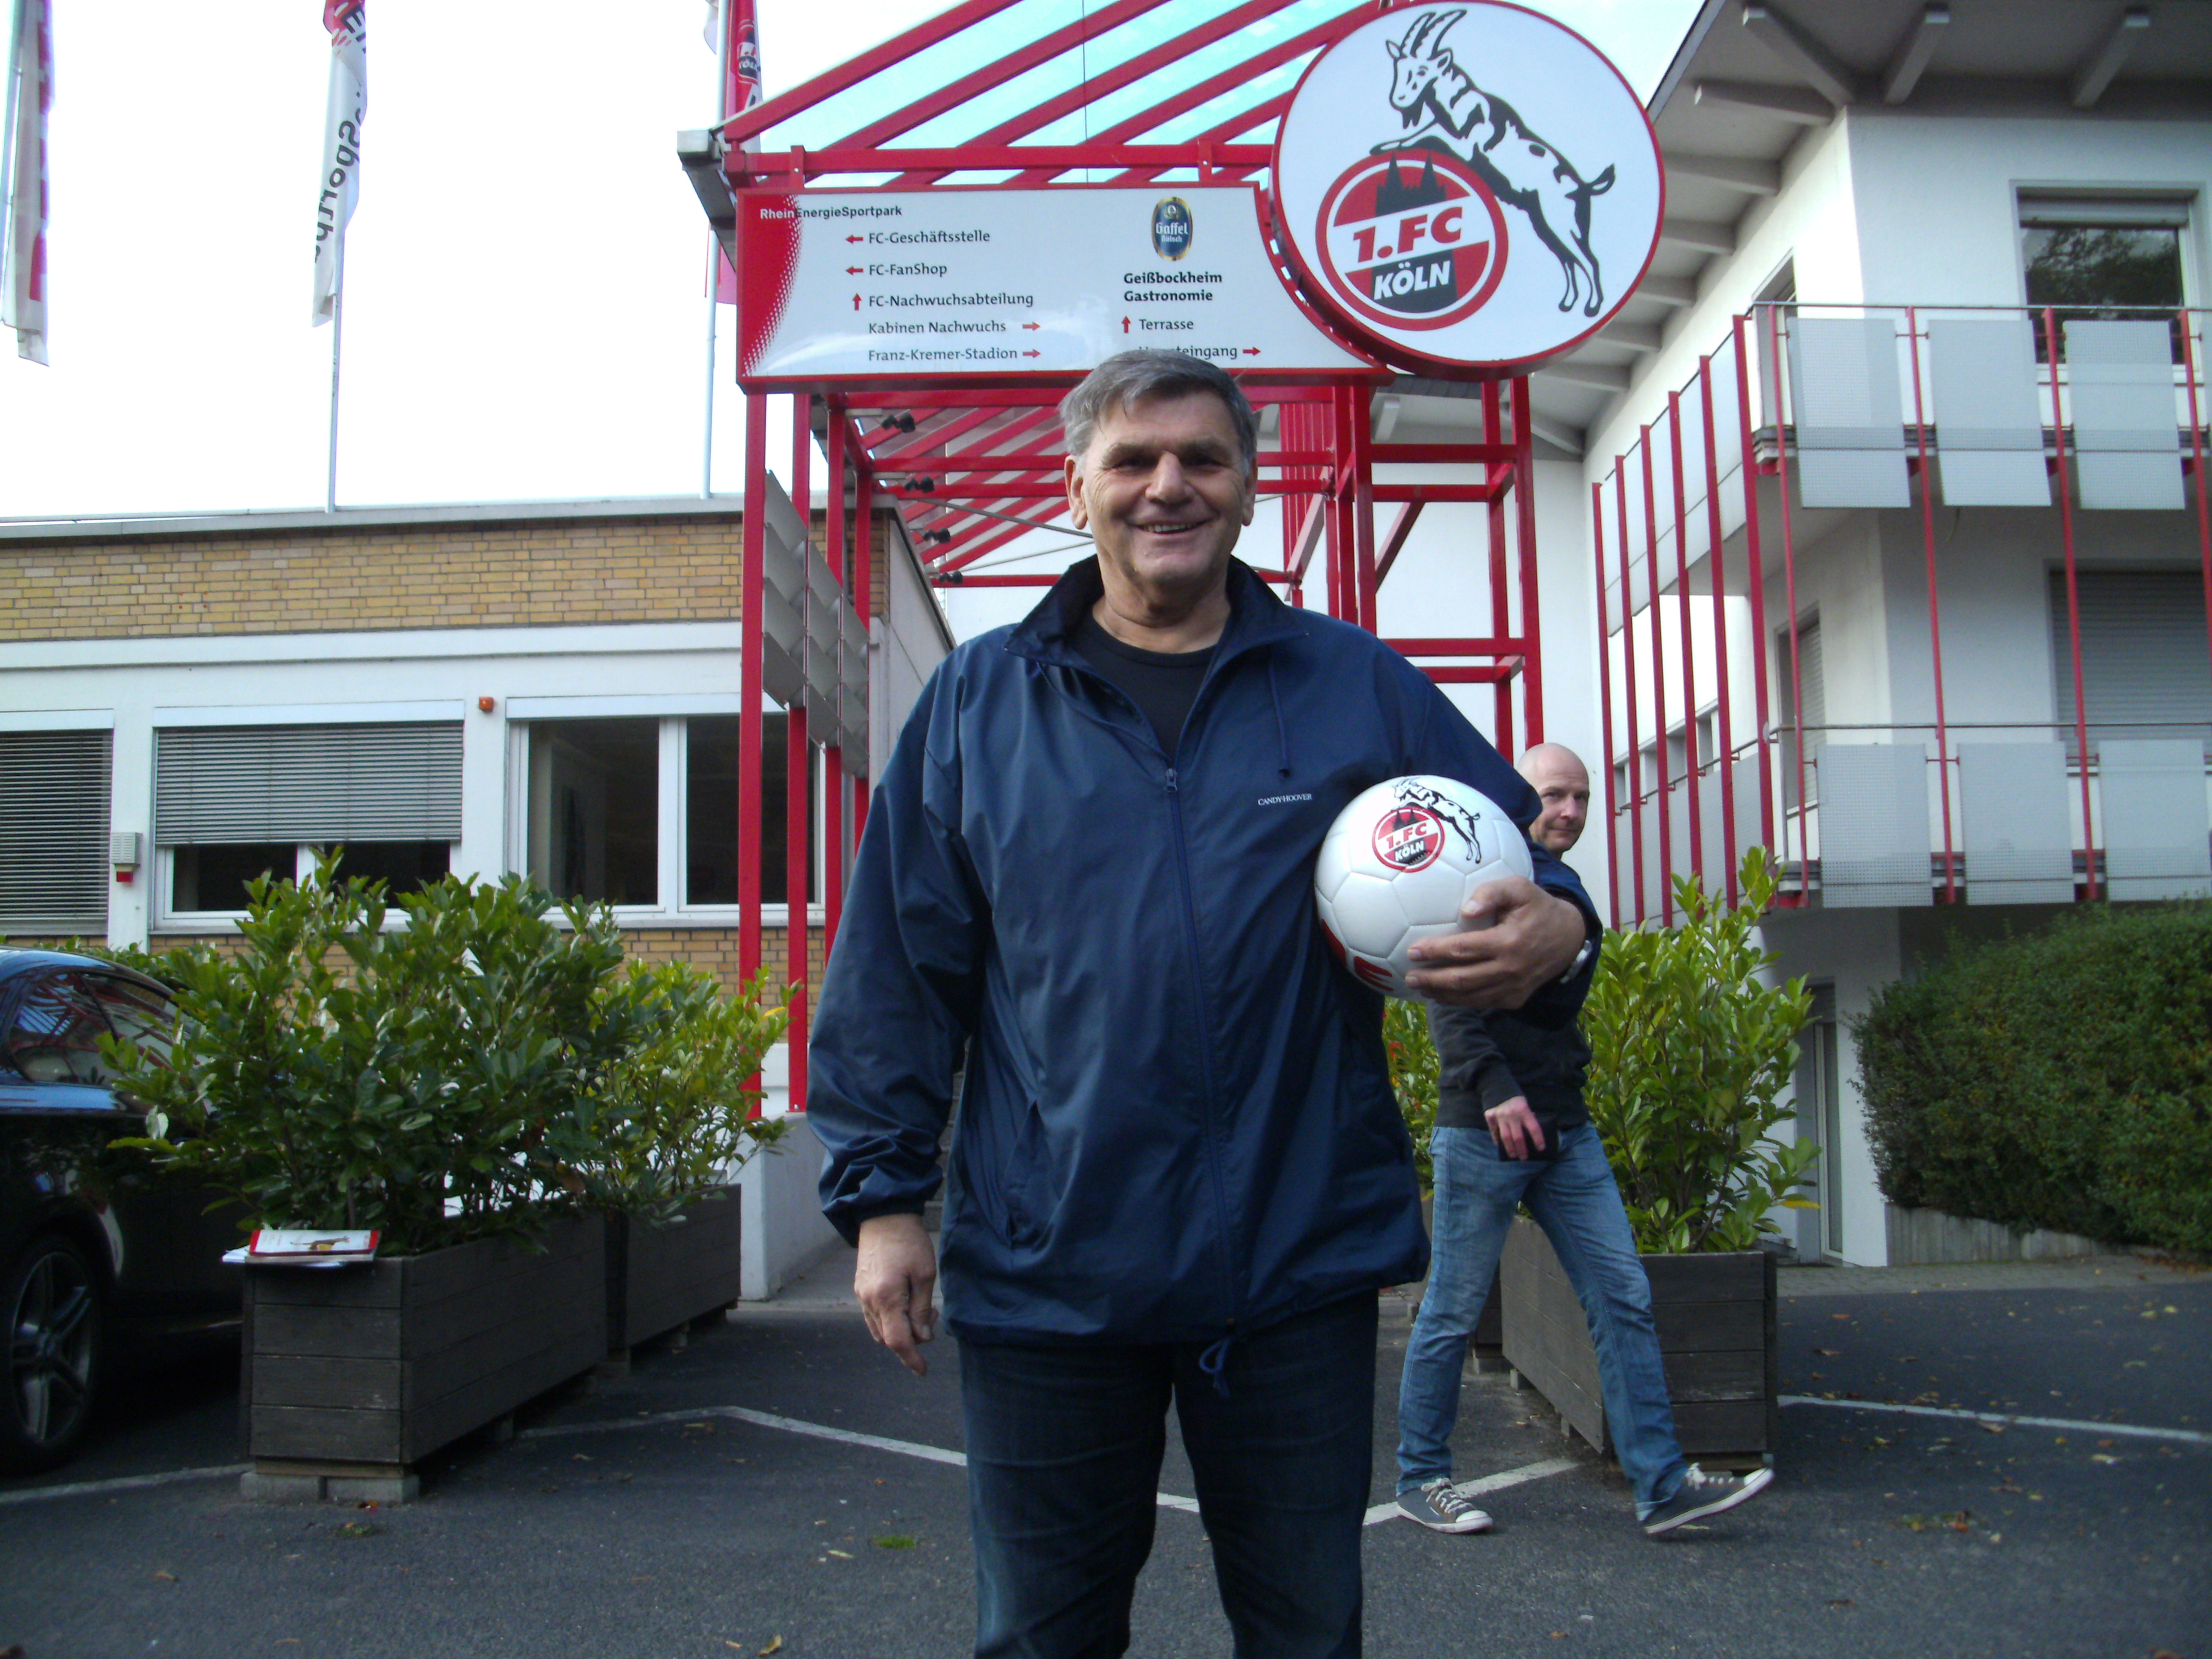 Wolfgang Weber feiert runden Geburtstag. Bei den FC-Fans ist der Porzer noch immer sehr beliebt. Foto: Köln.Sport